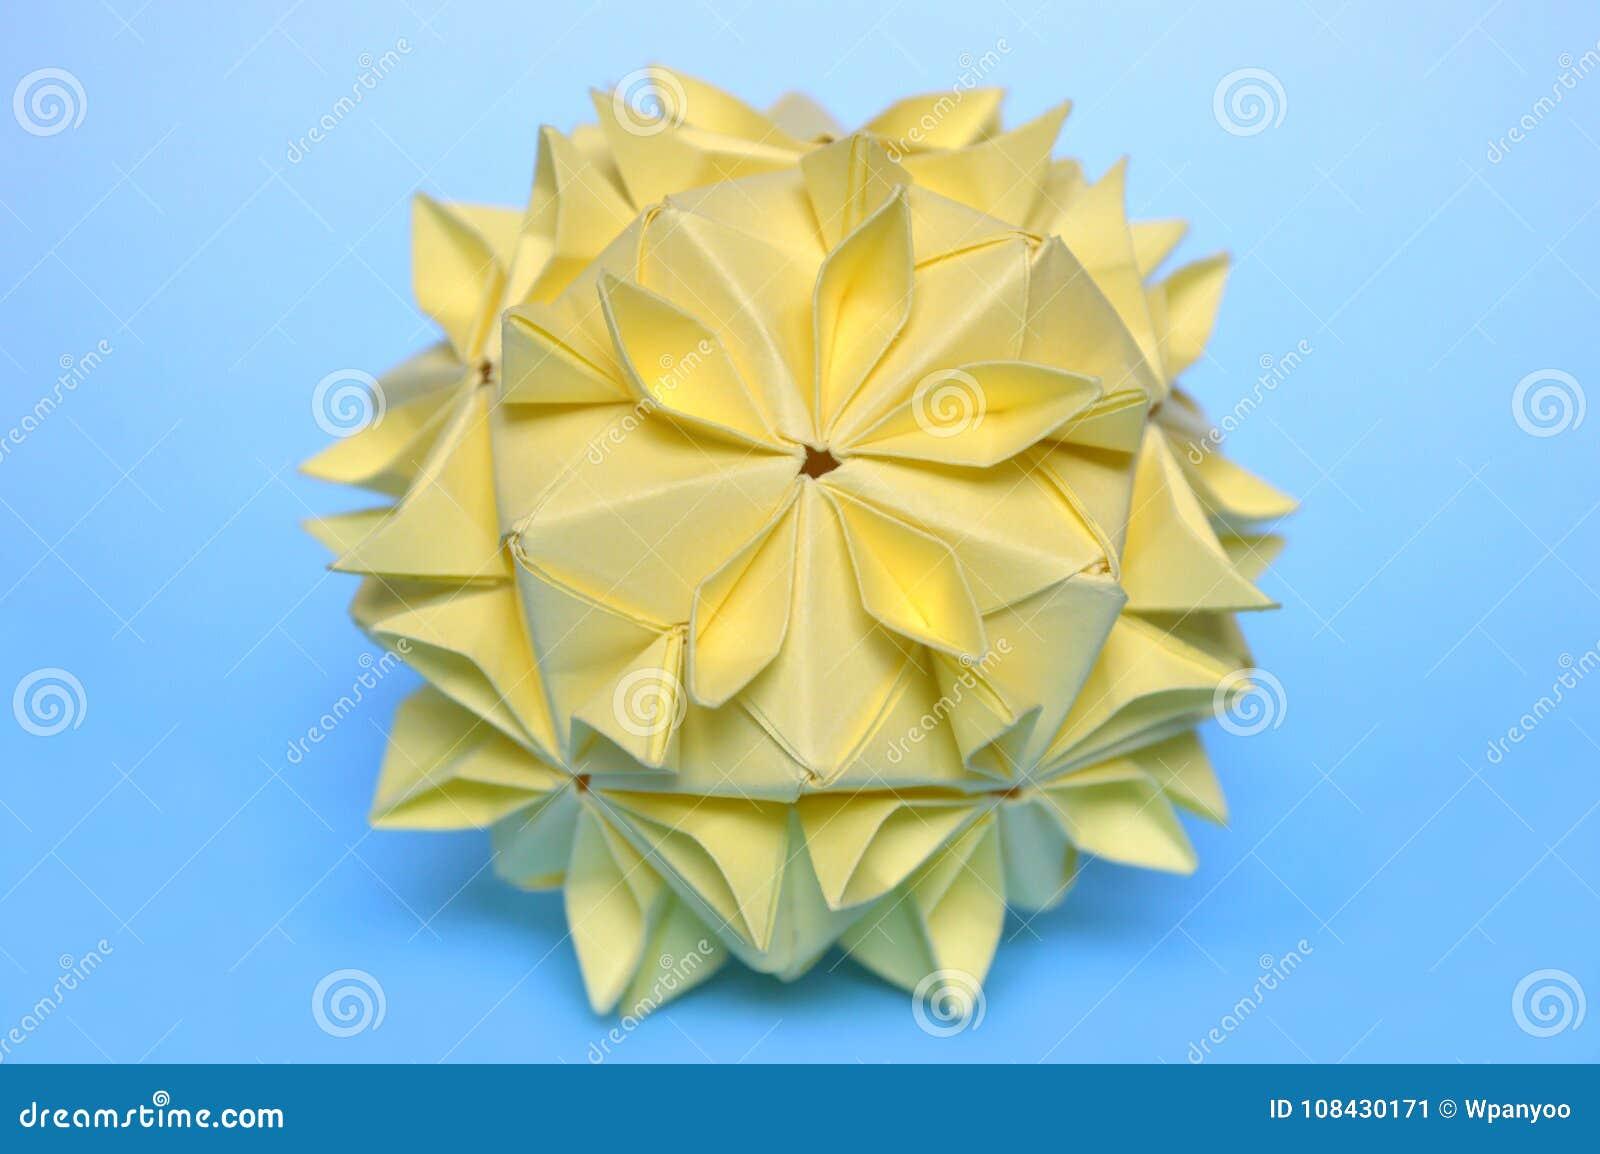 Modular Origami Cherry Blossom Ball Stock Image Image Of Blue